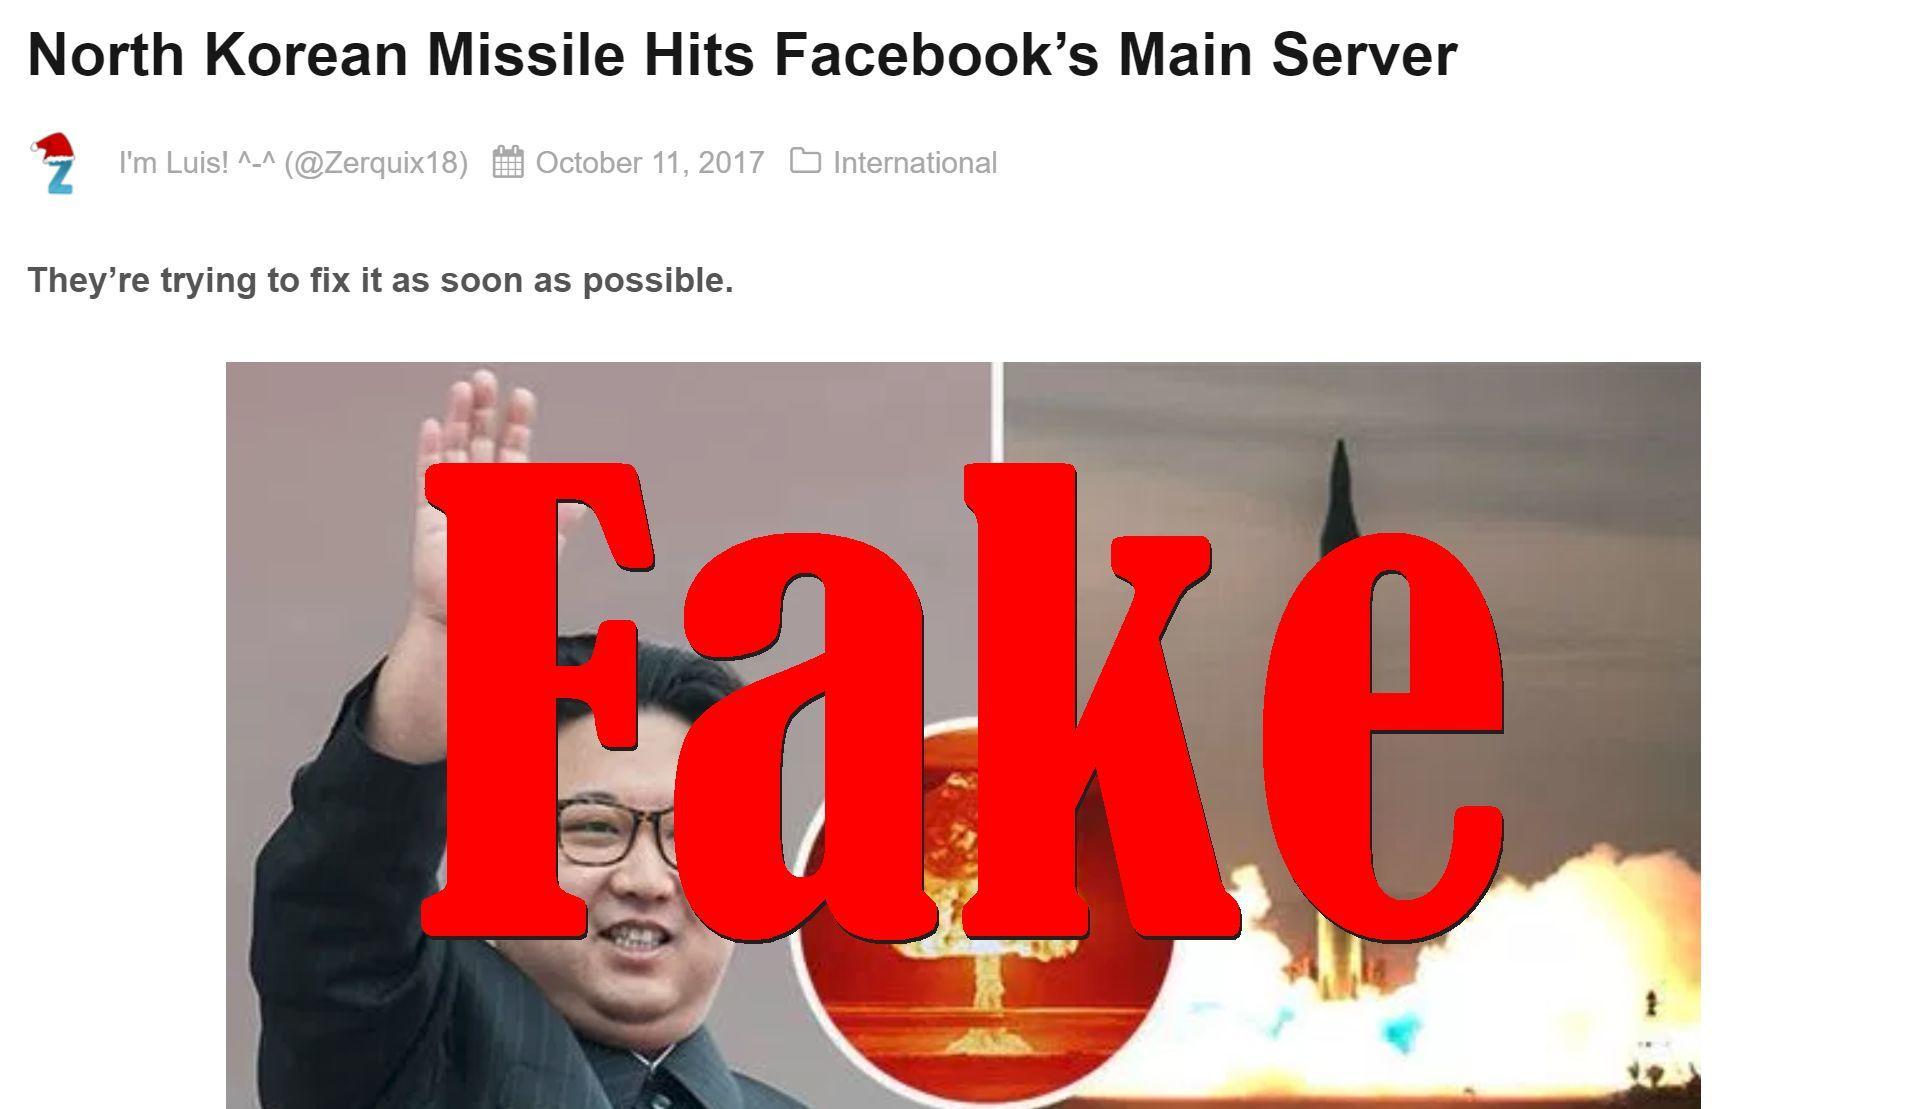 Fake News: North Korean Missile Did NOT Hit Facebook's Main Server